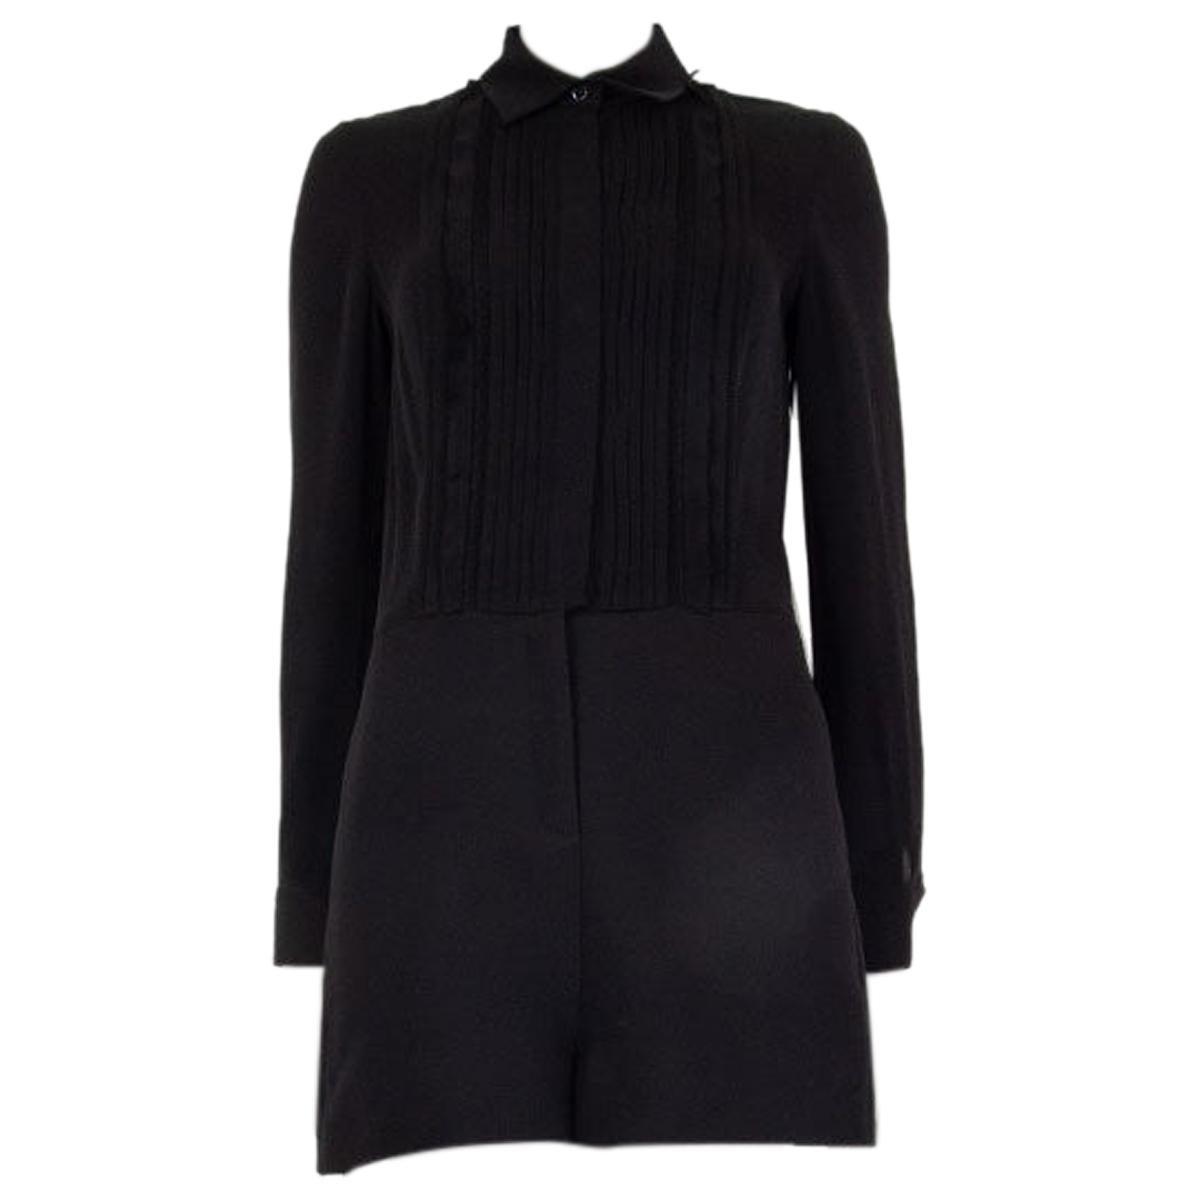 VALENTION black wool & silk PLEATED Long Sleeve Jumpsuit Romper 40 S